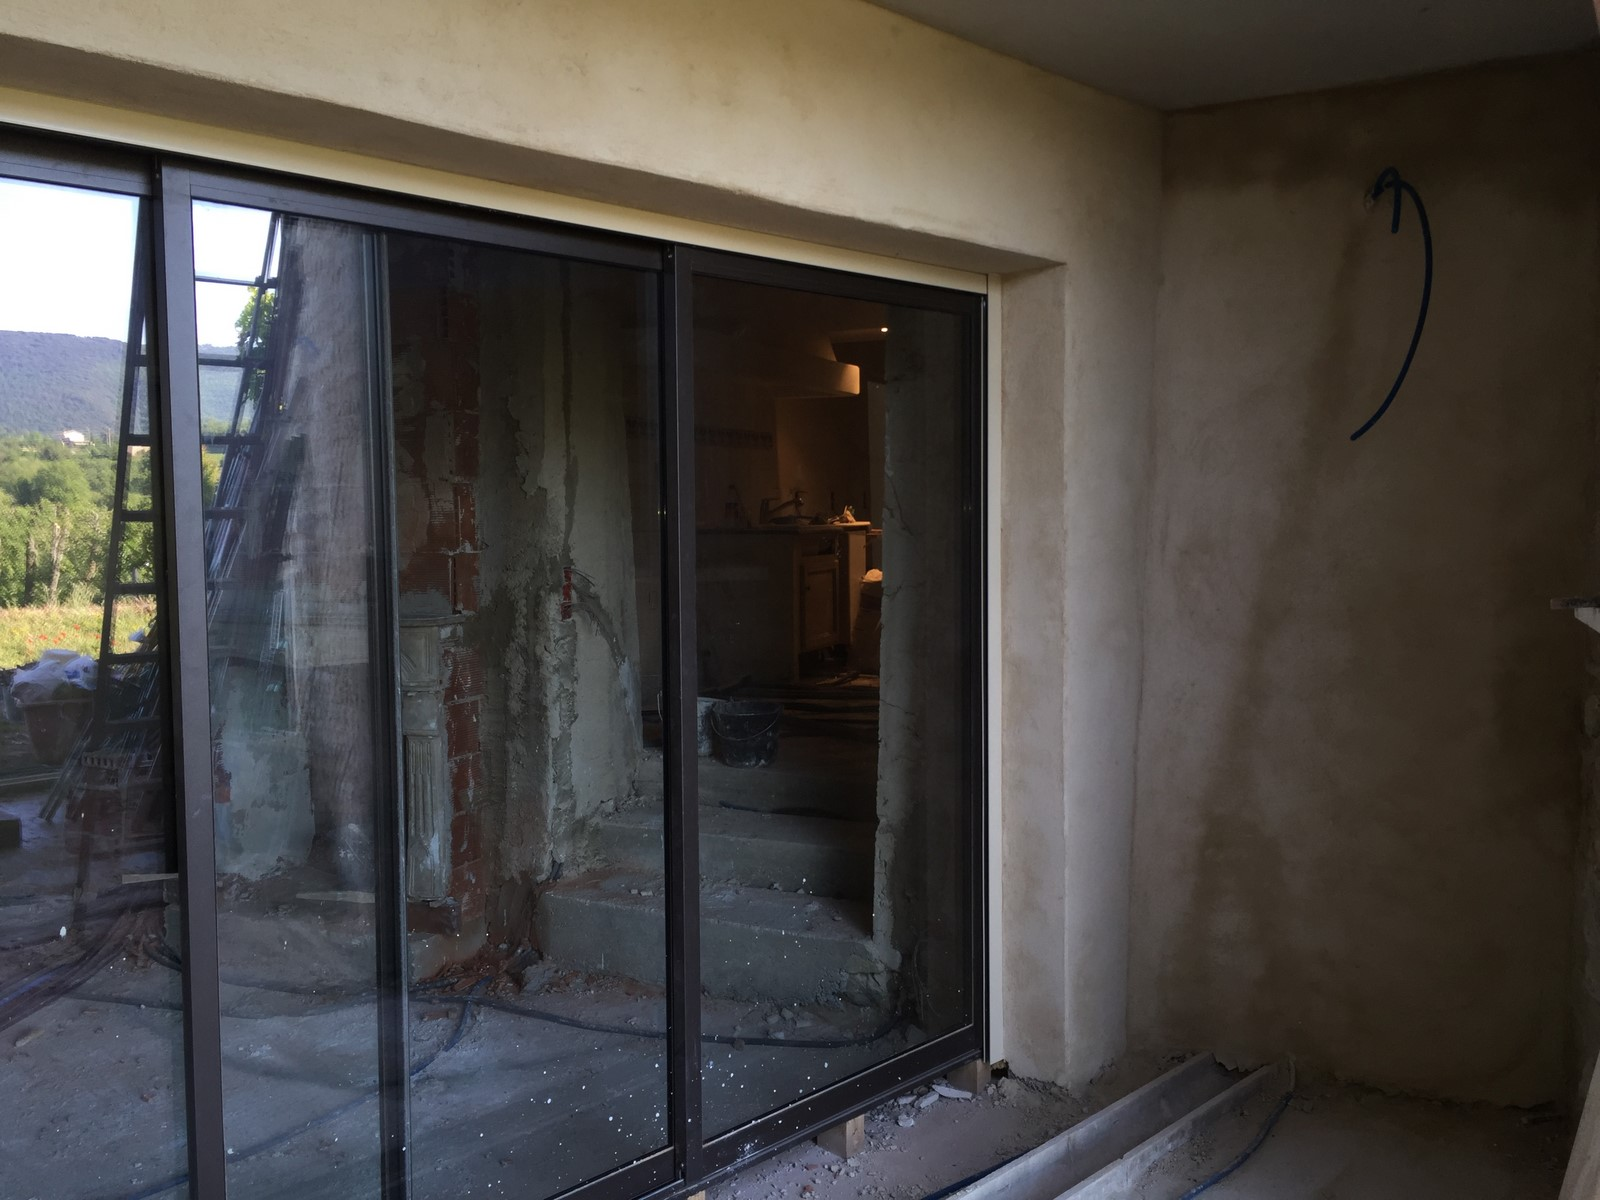 pose de menuiserie isolation revetement plafond pose menuiserie viguier ma onnerie apt. Black Bedroom Furniture Sets. Home Design Ideas